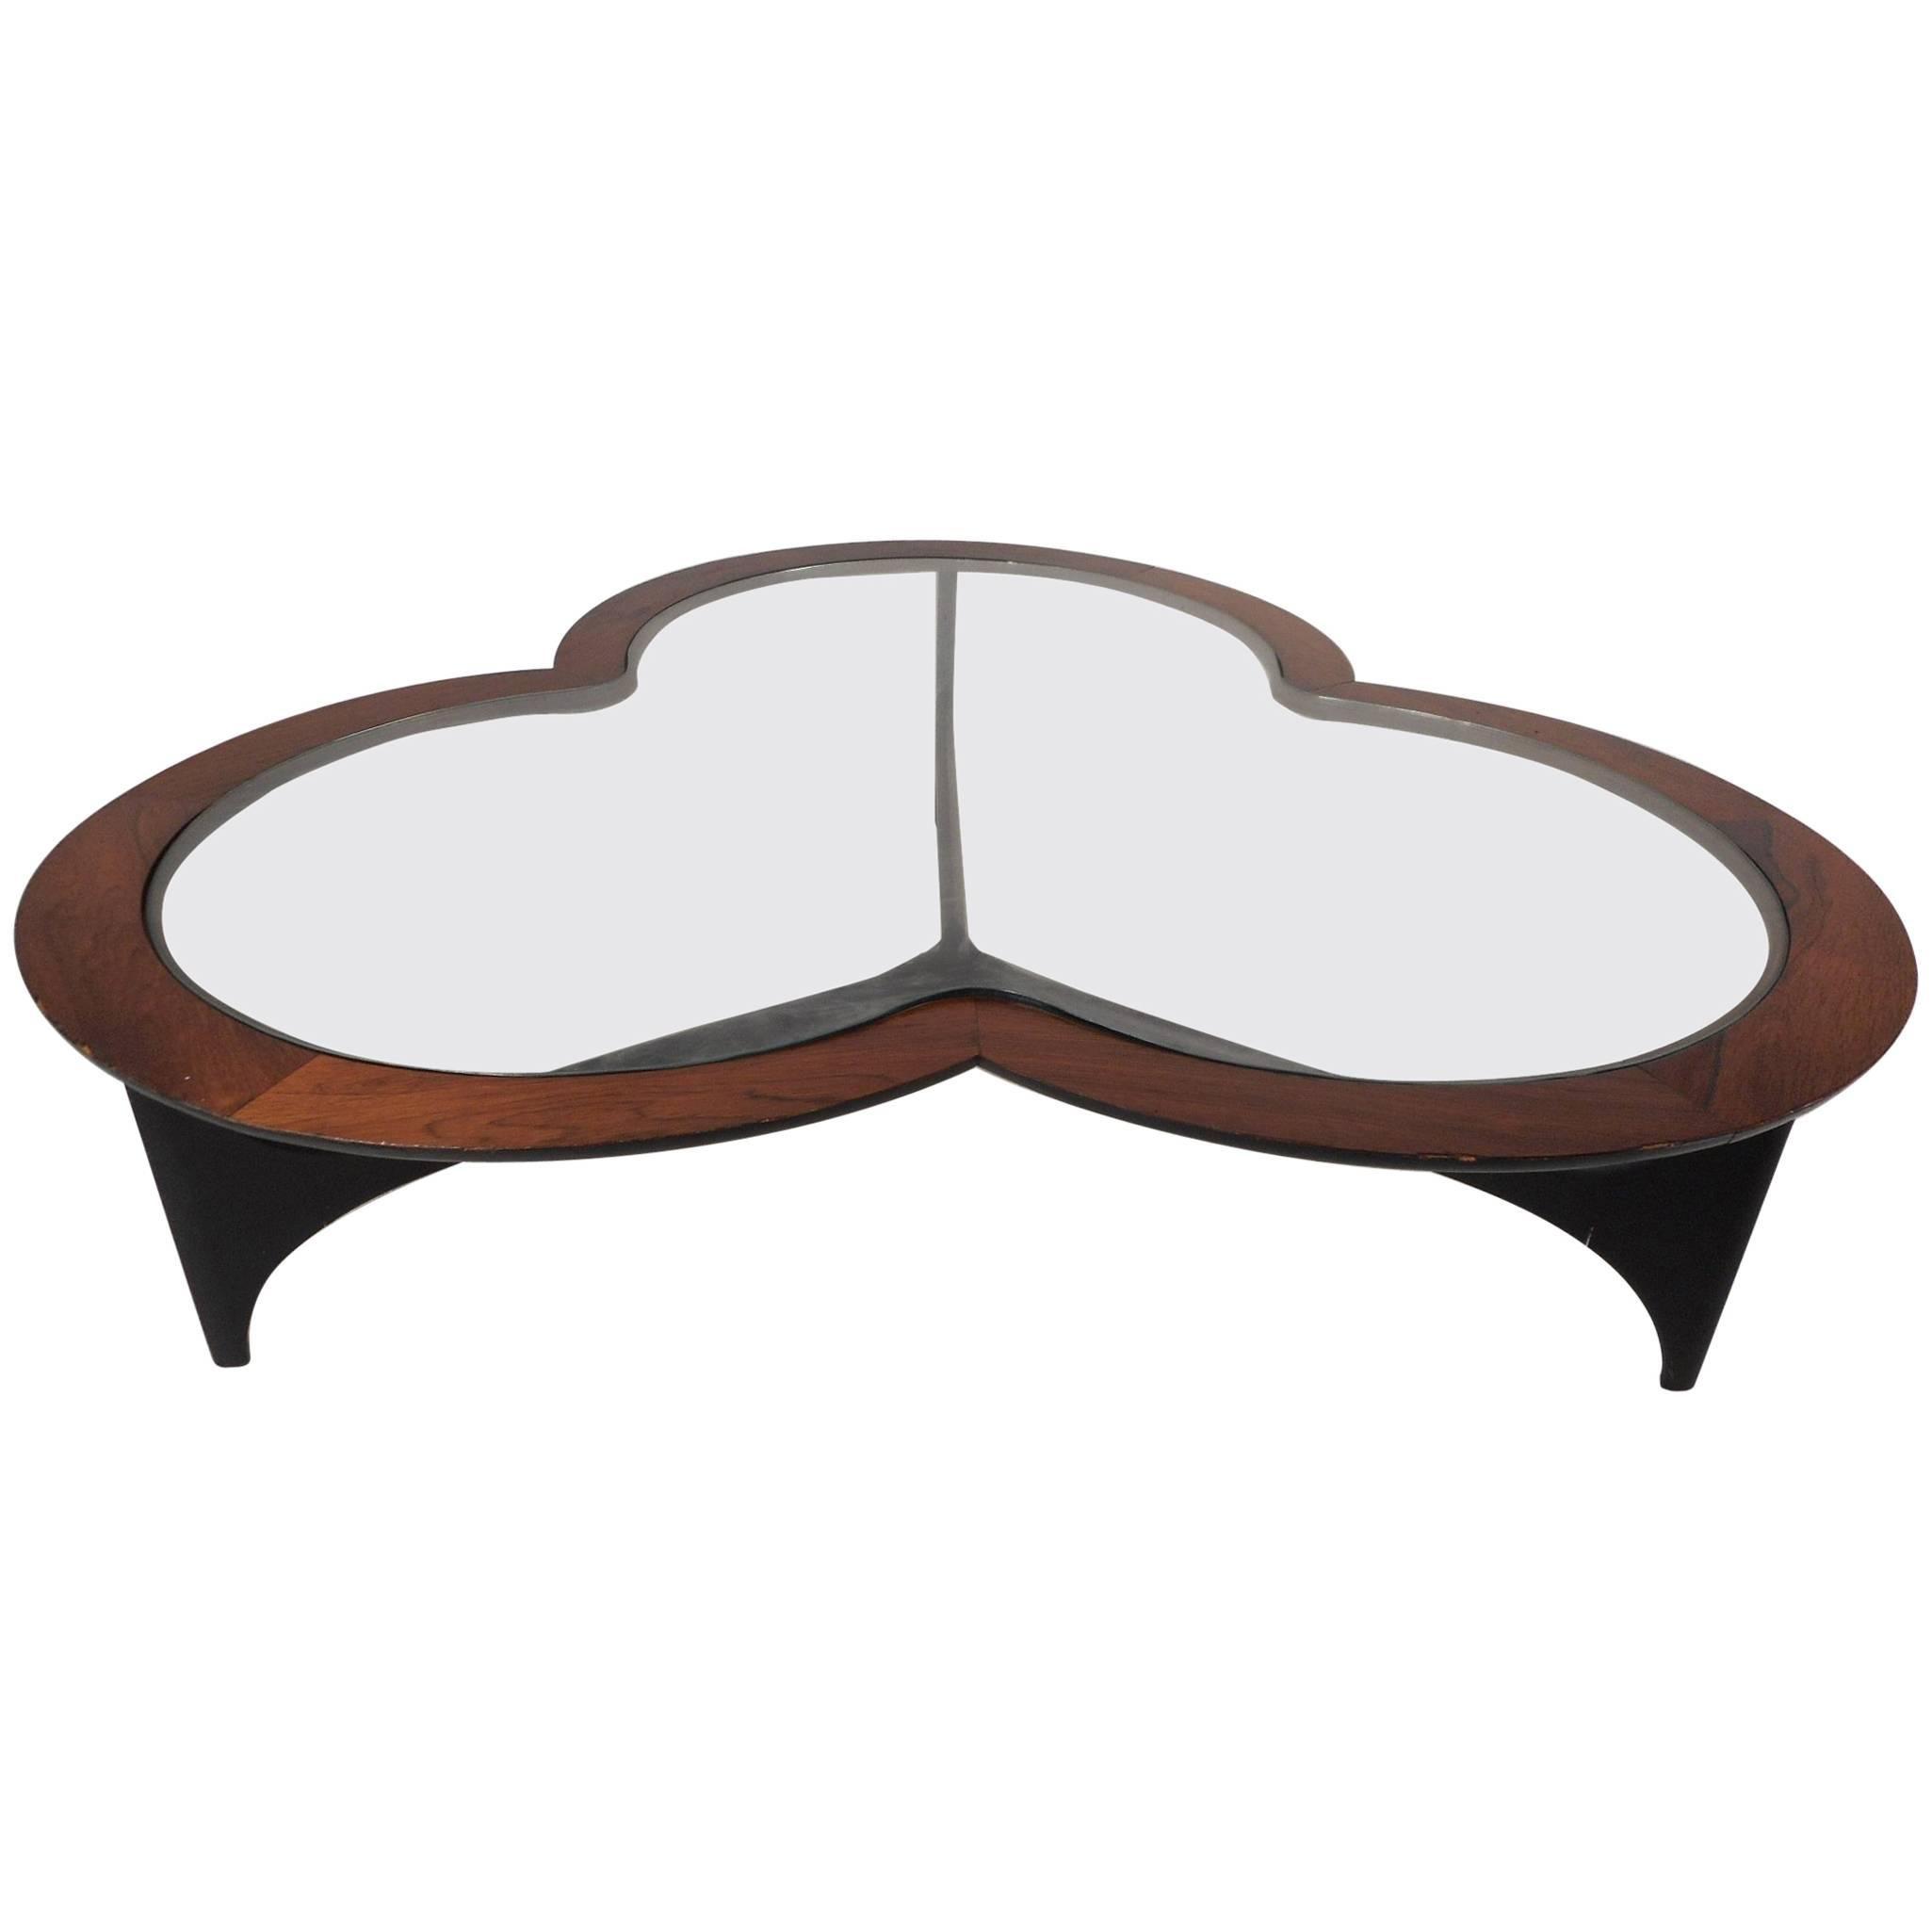 midcentury modern threeleaf clover walnut coffee table by lane furniture